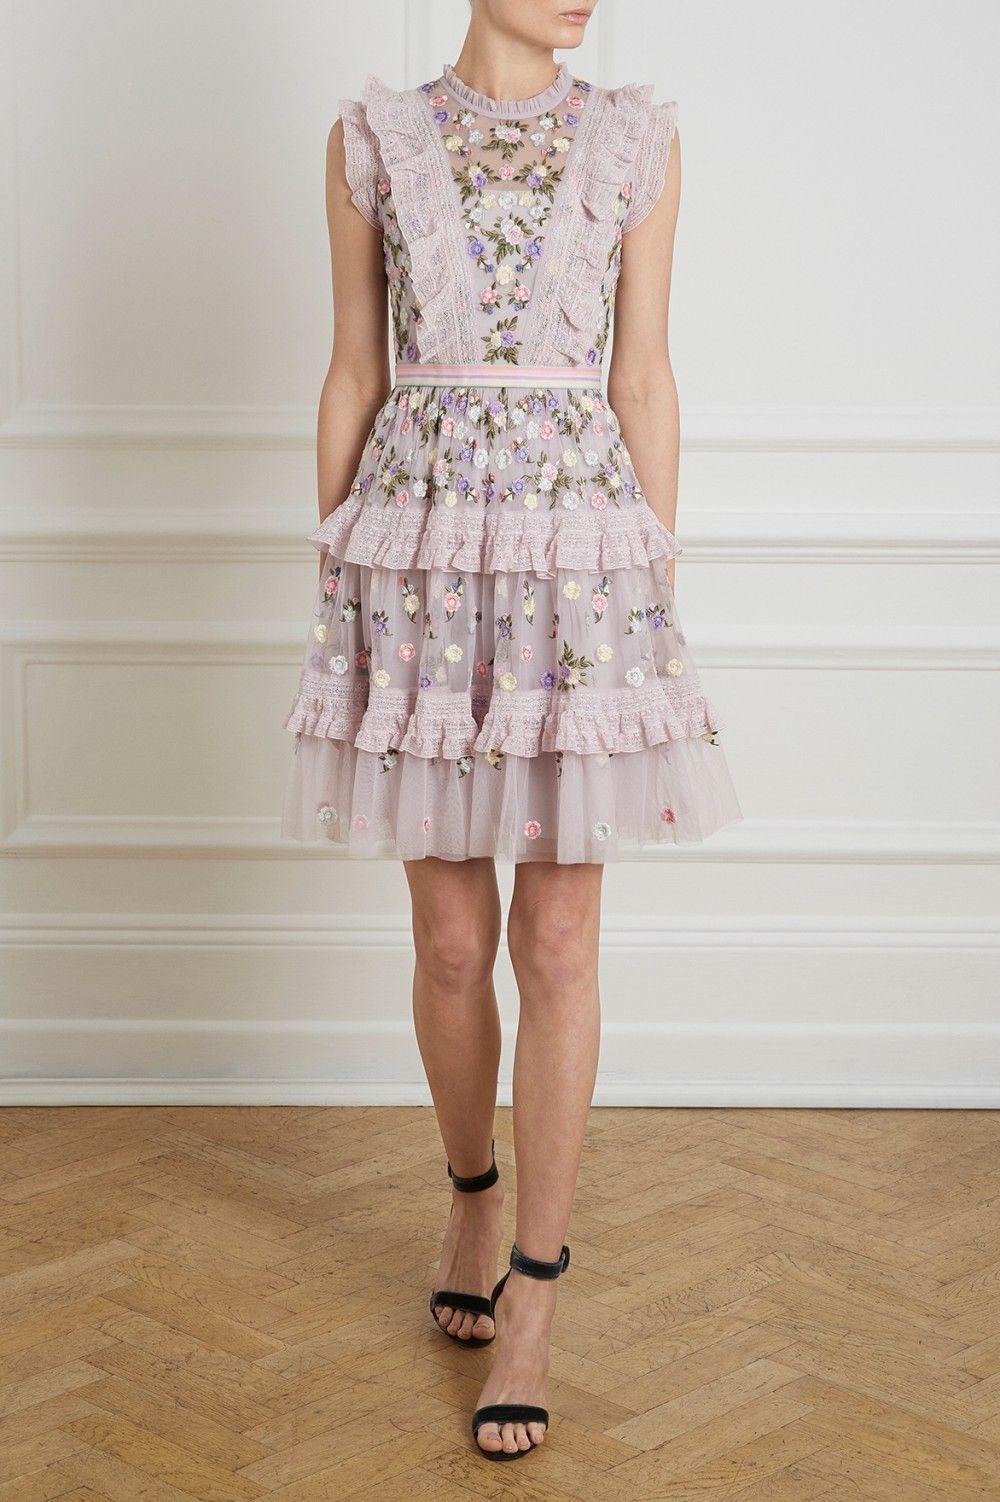 Prism Ditsy Mini Dress Needle Thread Needle Thread Wedding Guest Dress Summer Best Wedding Guest Dresses Casual Dresses